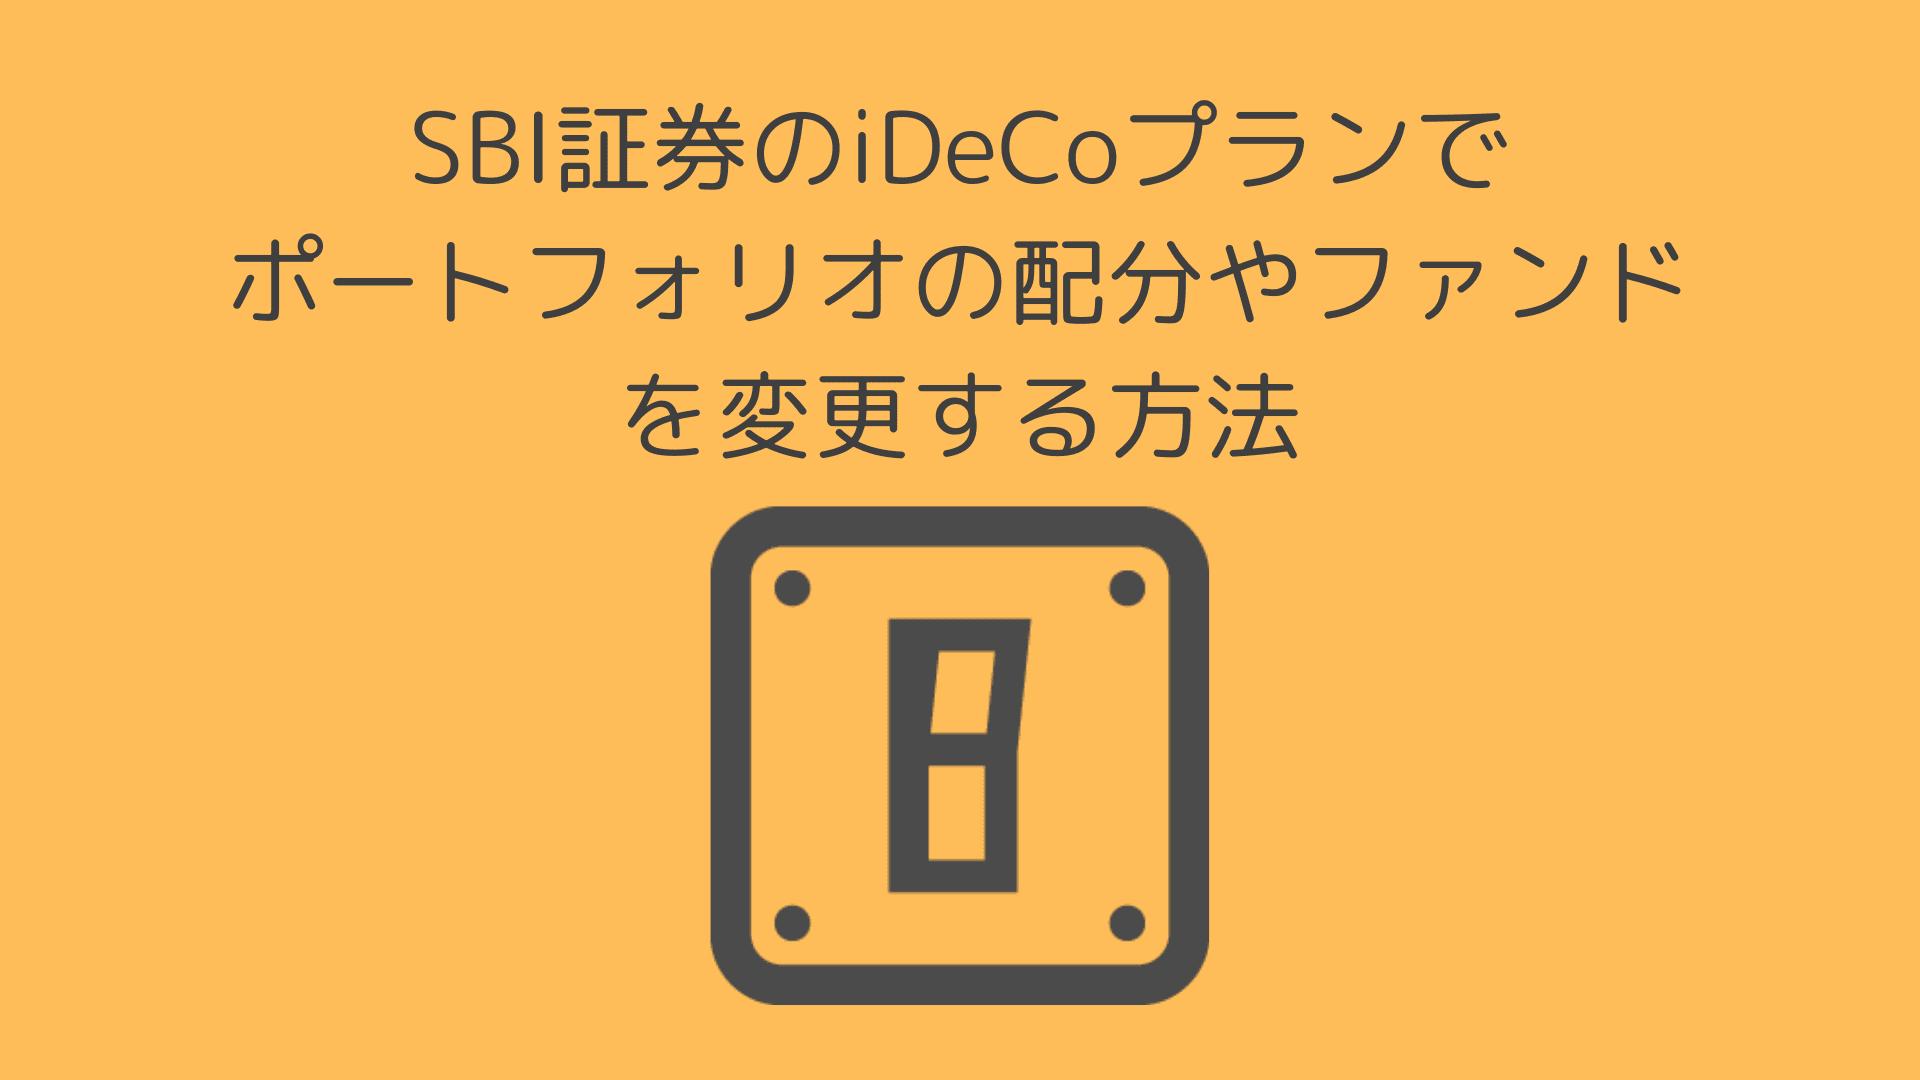 SBI証券のiDeCoプランでポートフォリオの配分やファンドを変更する方法